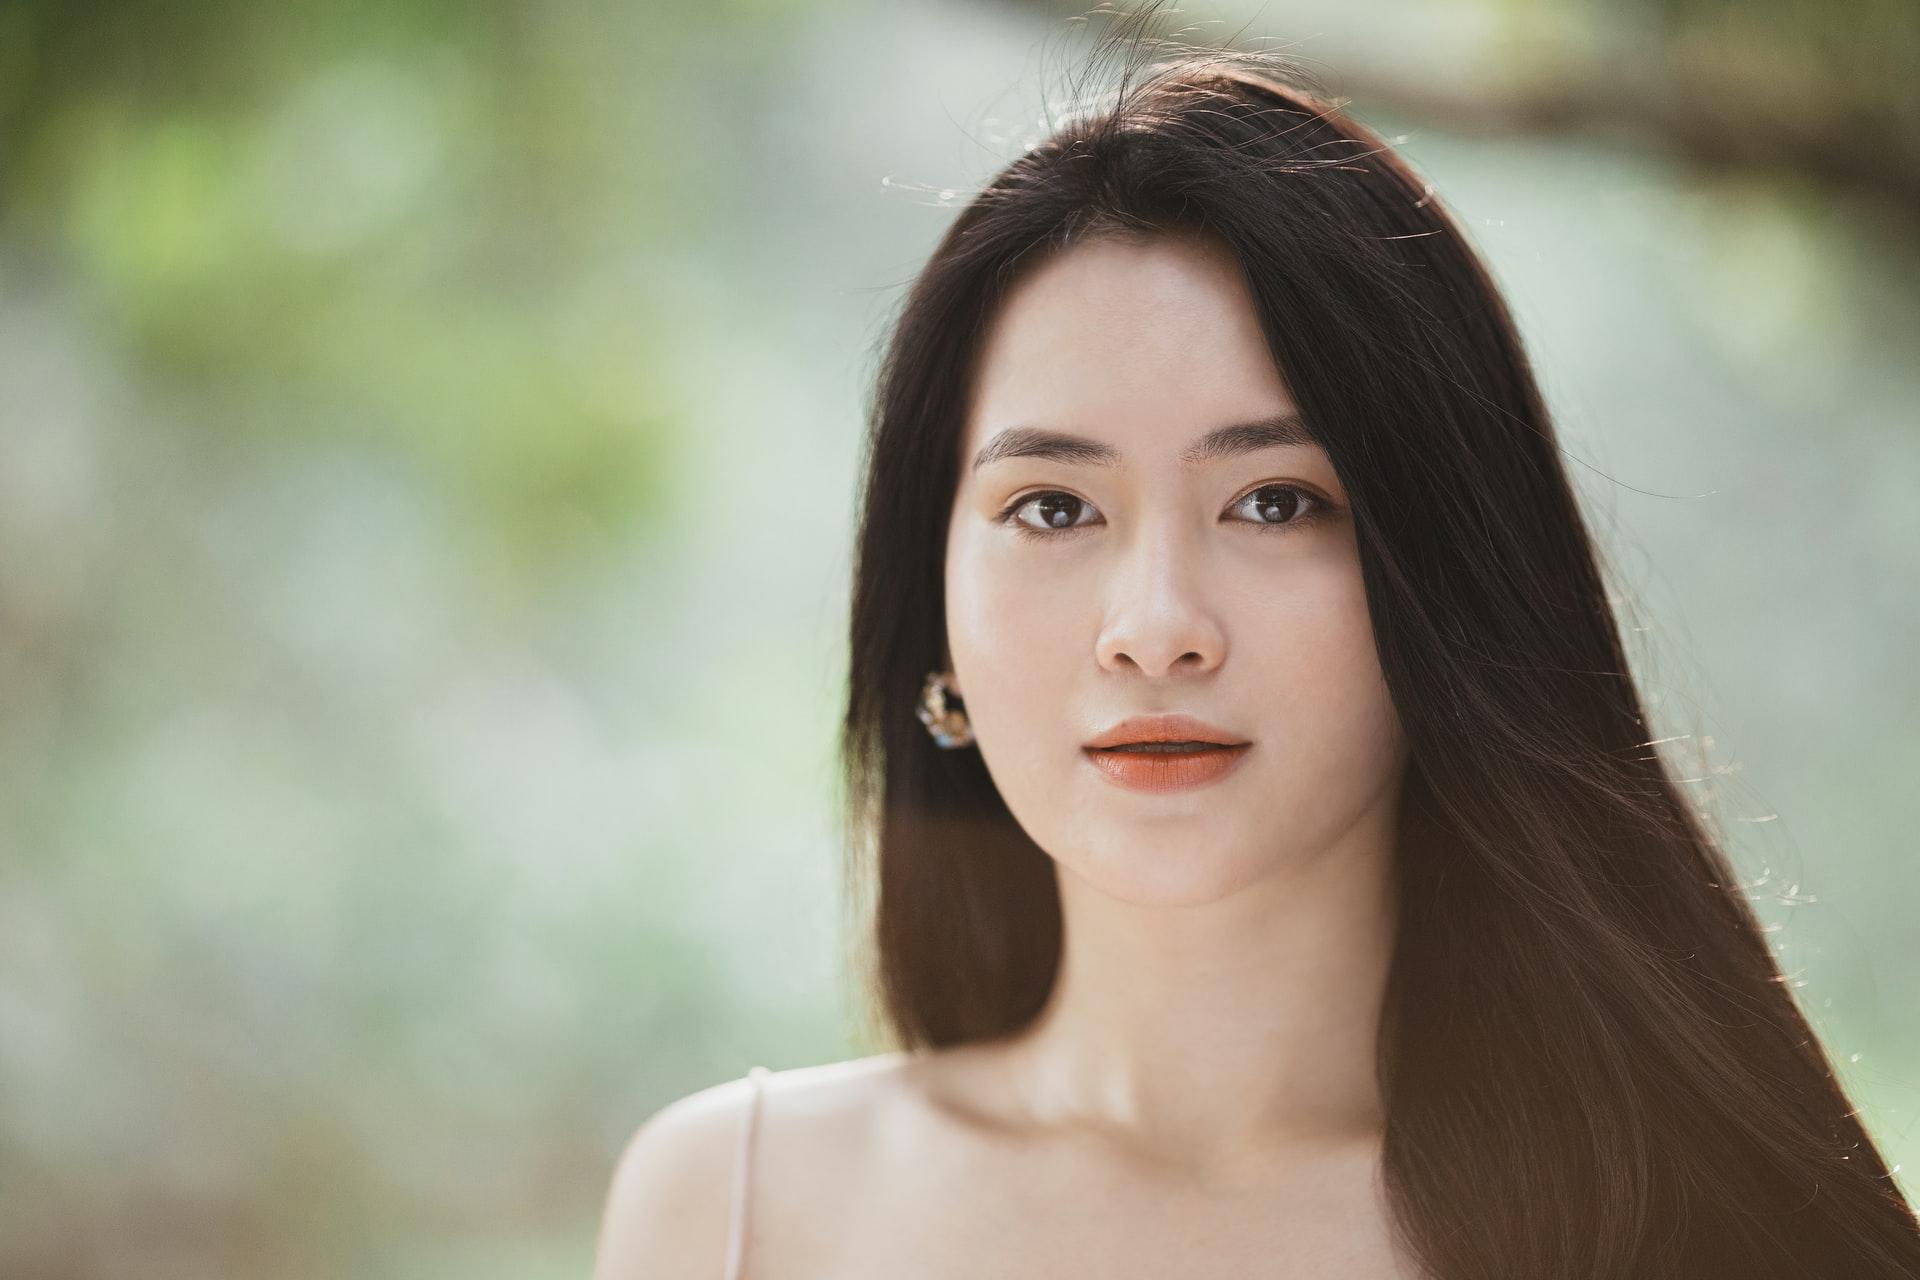 Japanese girl with long beautiful hair